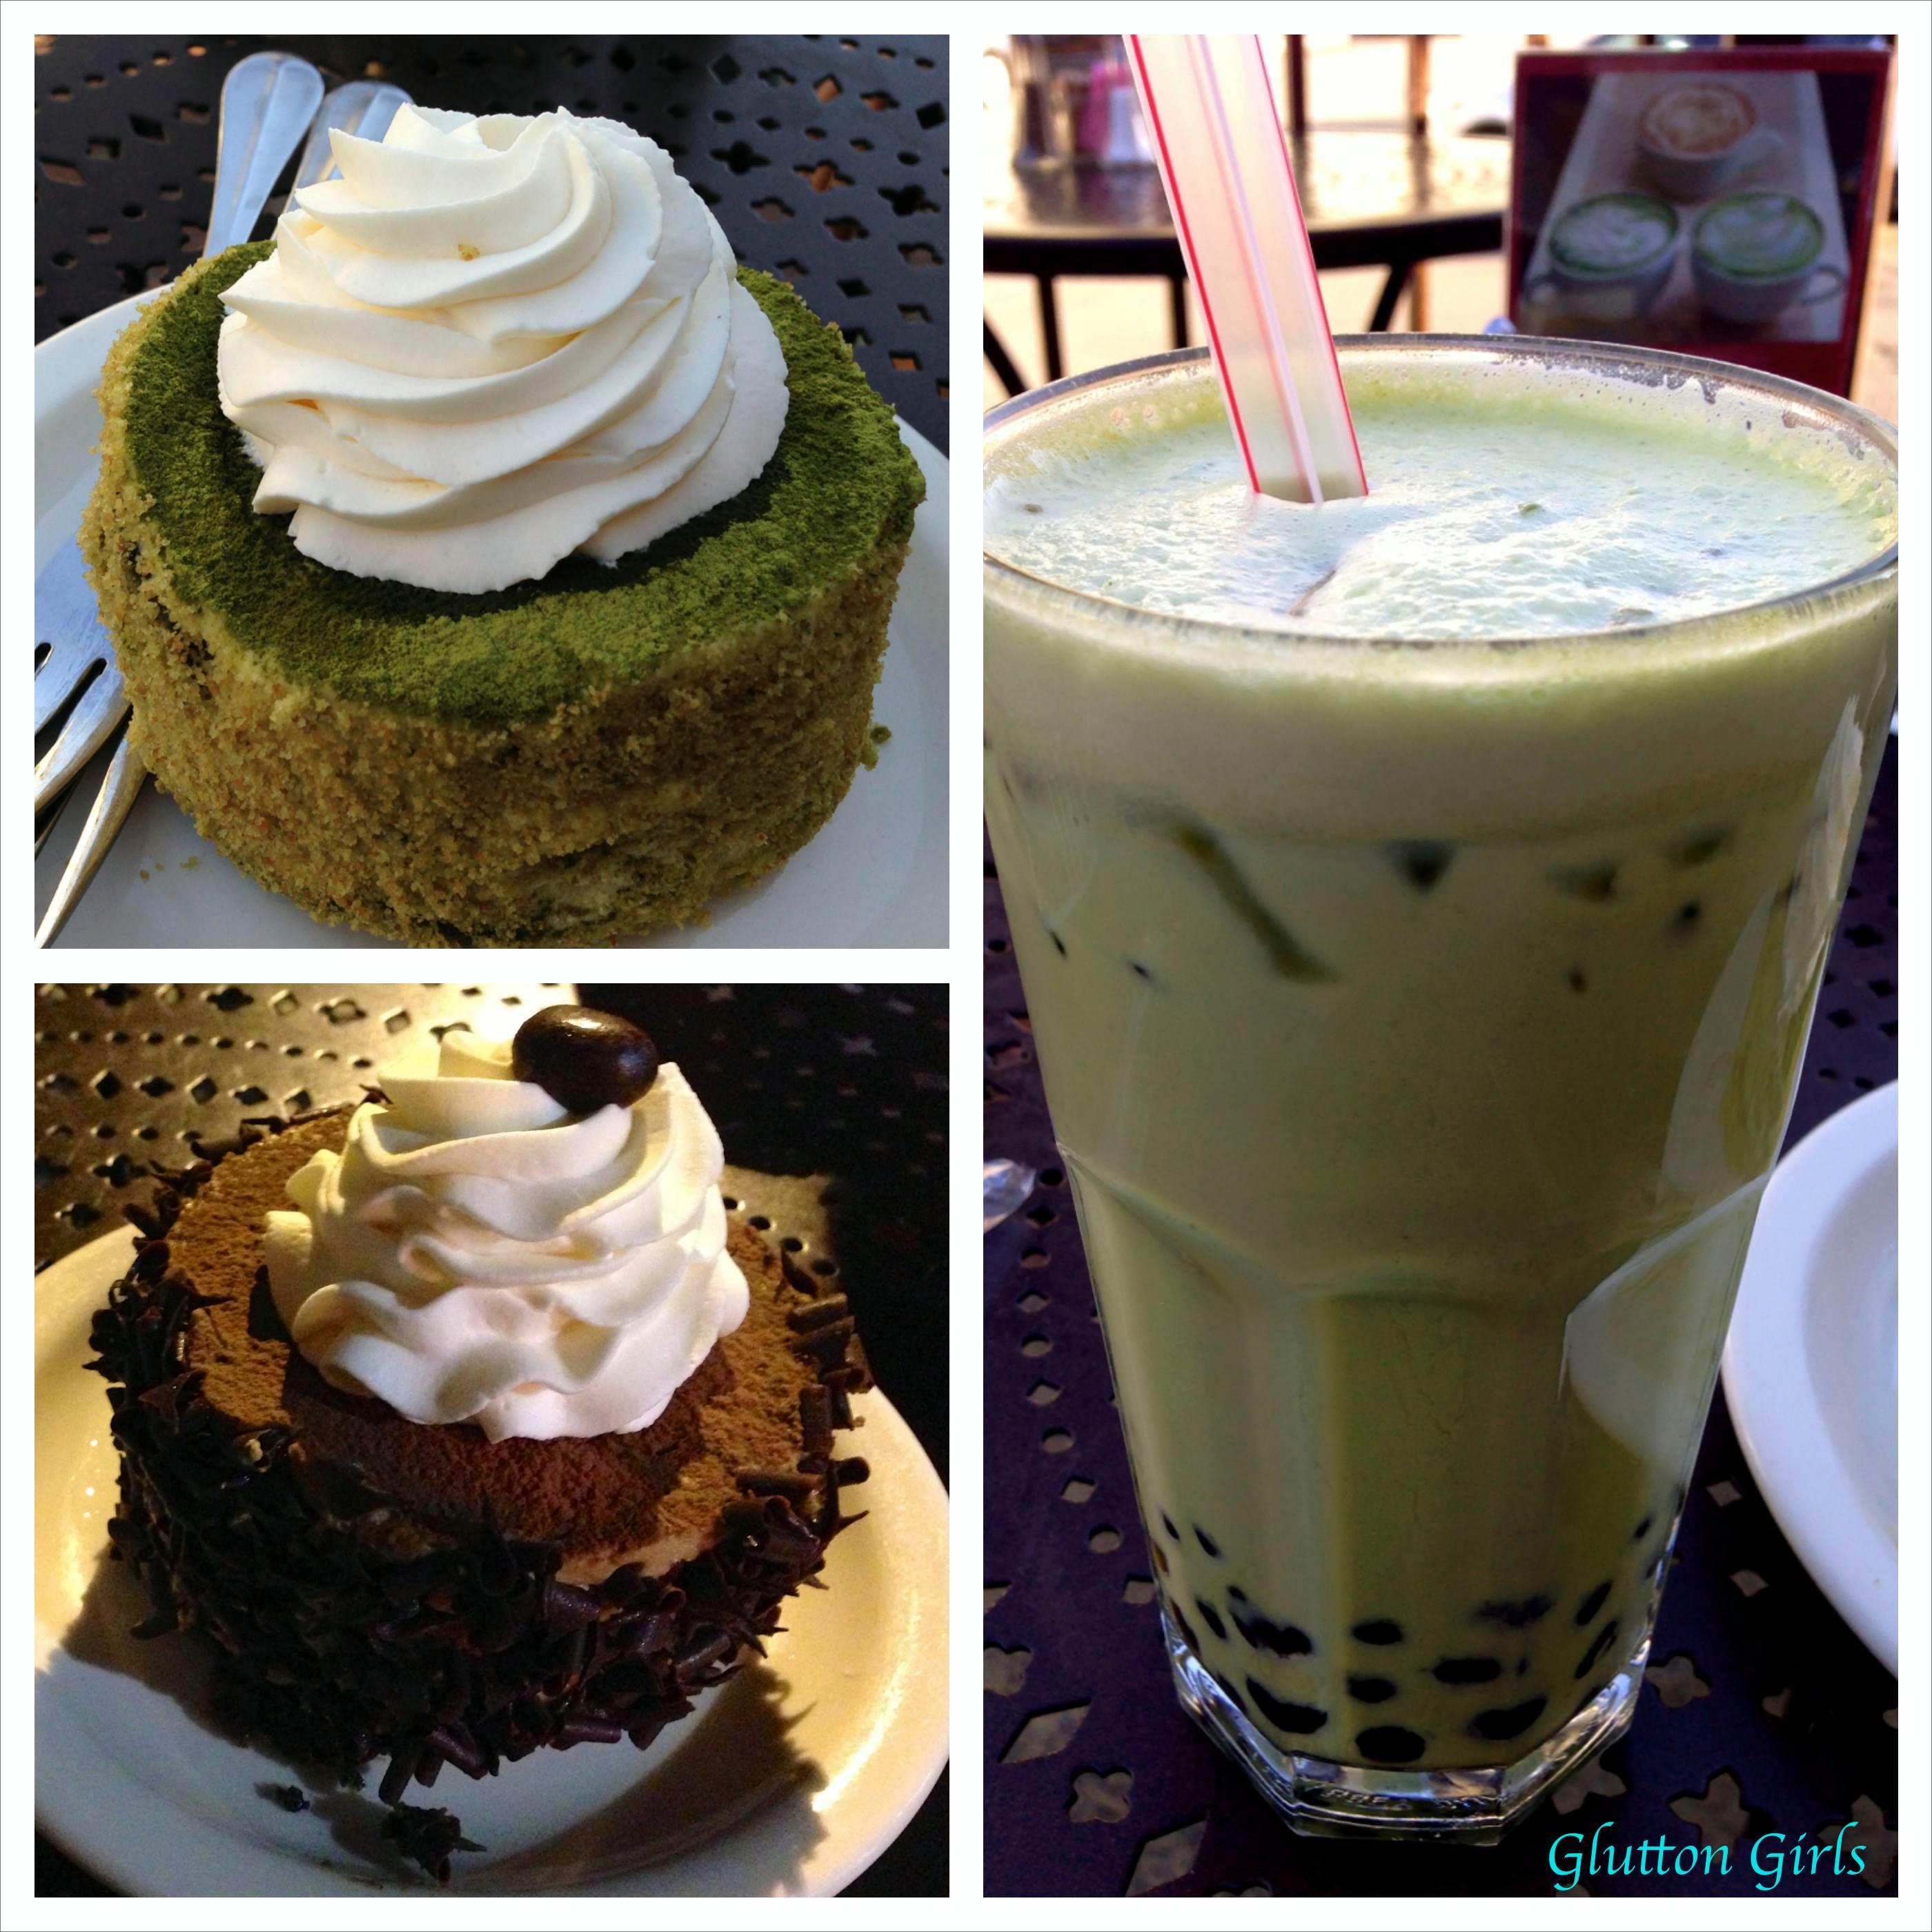 Belgian Lemon Tea Cake Recipe Sbs Food: Top 8 Local Los Angeles Dessert Bucket List For The Sweet